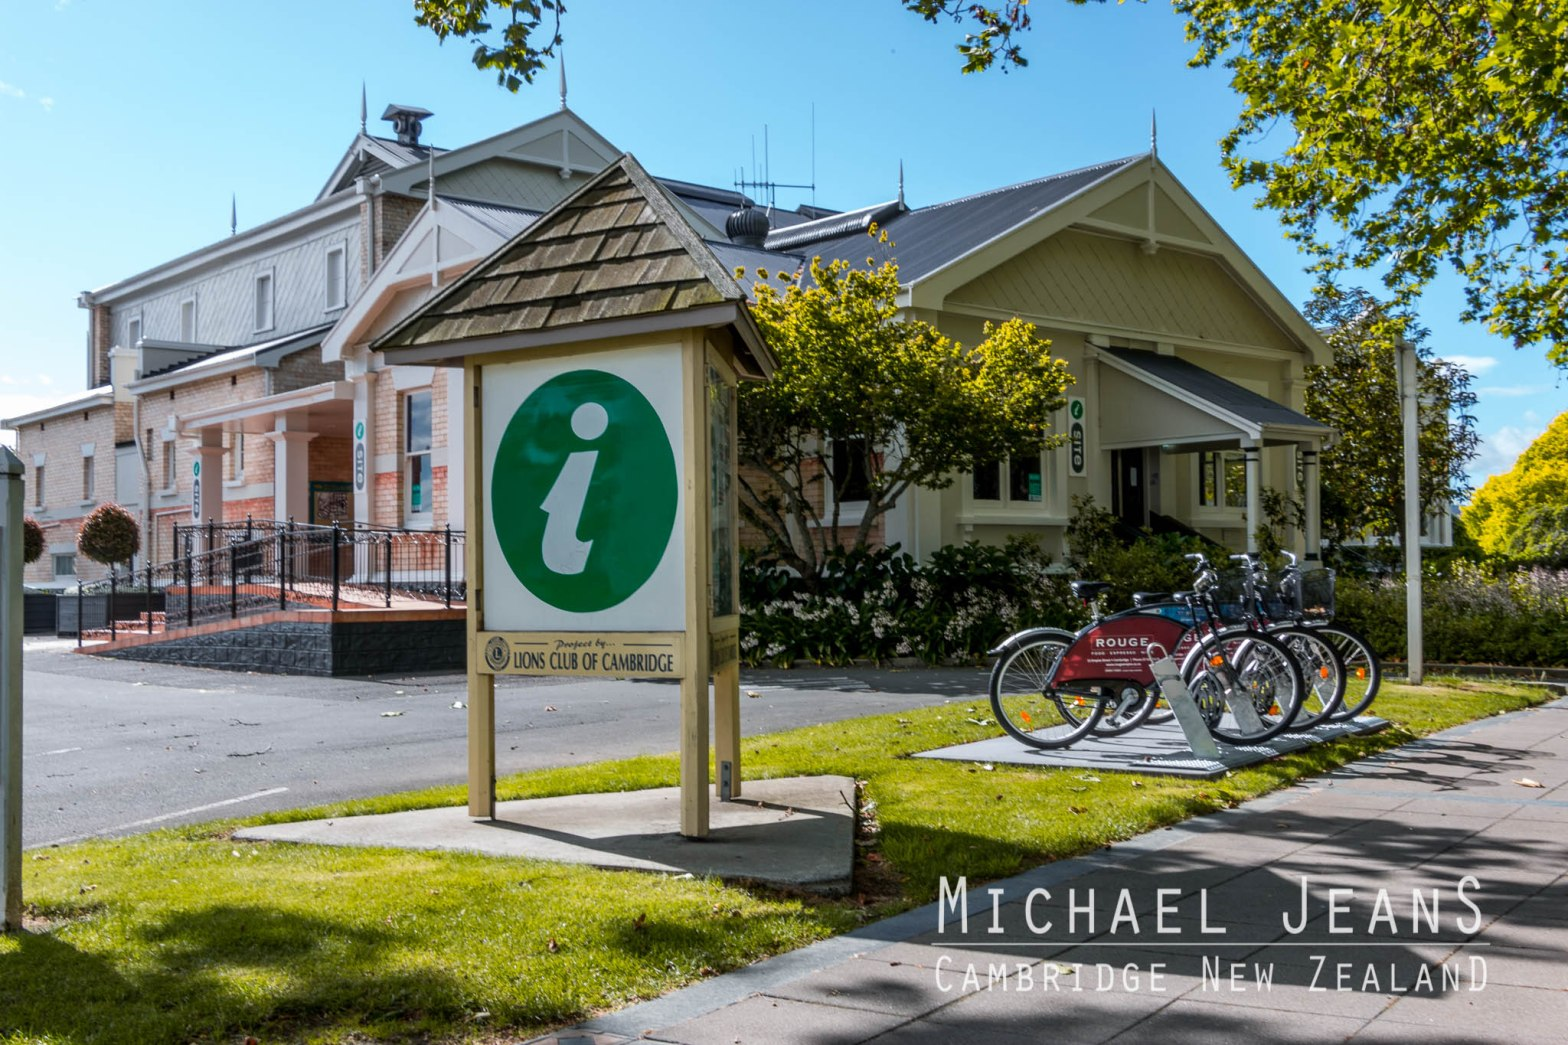 Rouge Nextbike iSite Town Hall Victoria Street Cambridge New Zealand